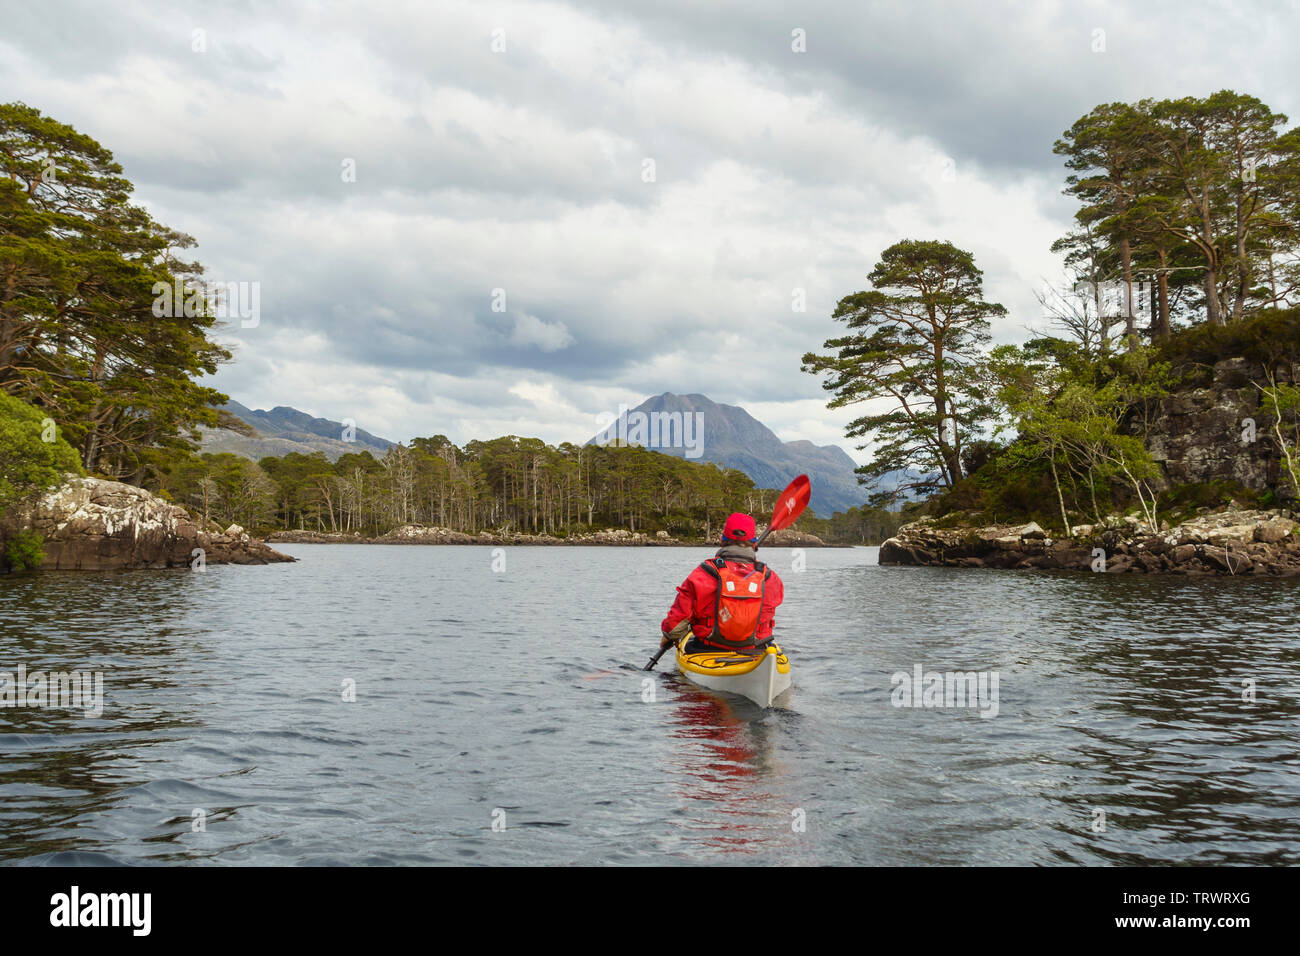 Kayaking on Loch Maree, Wester Ross, Highlands, Scotland - Stock Image